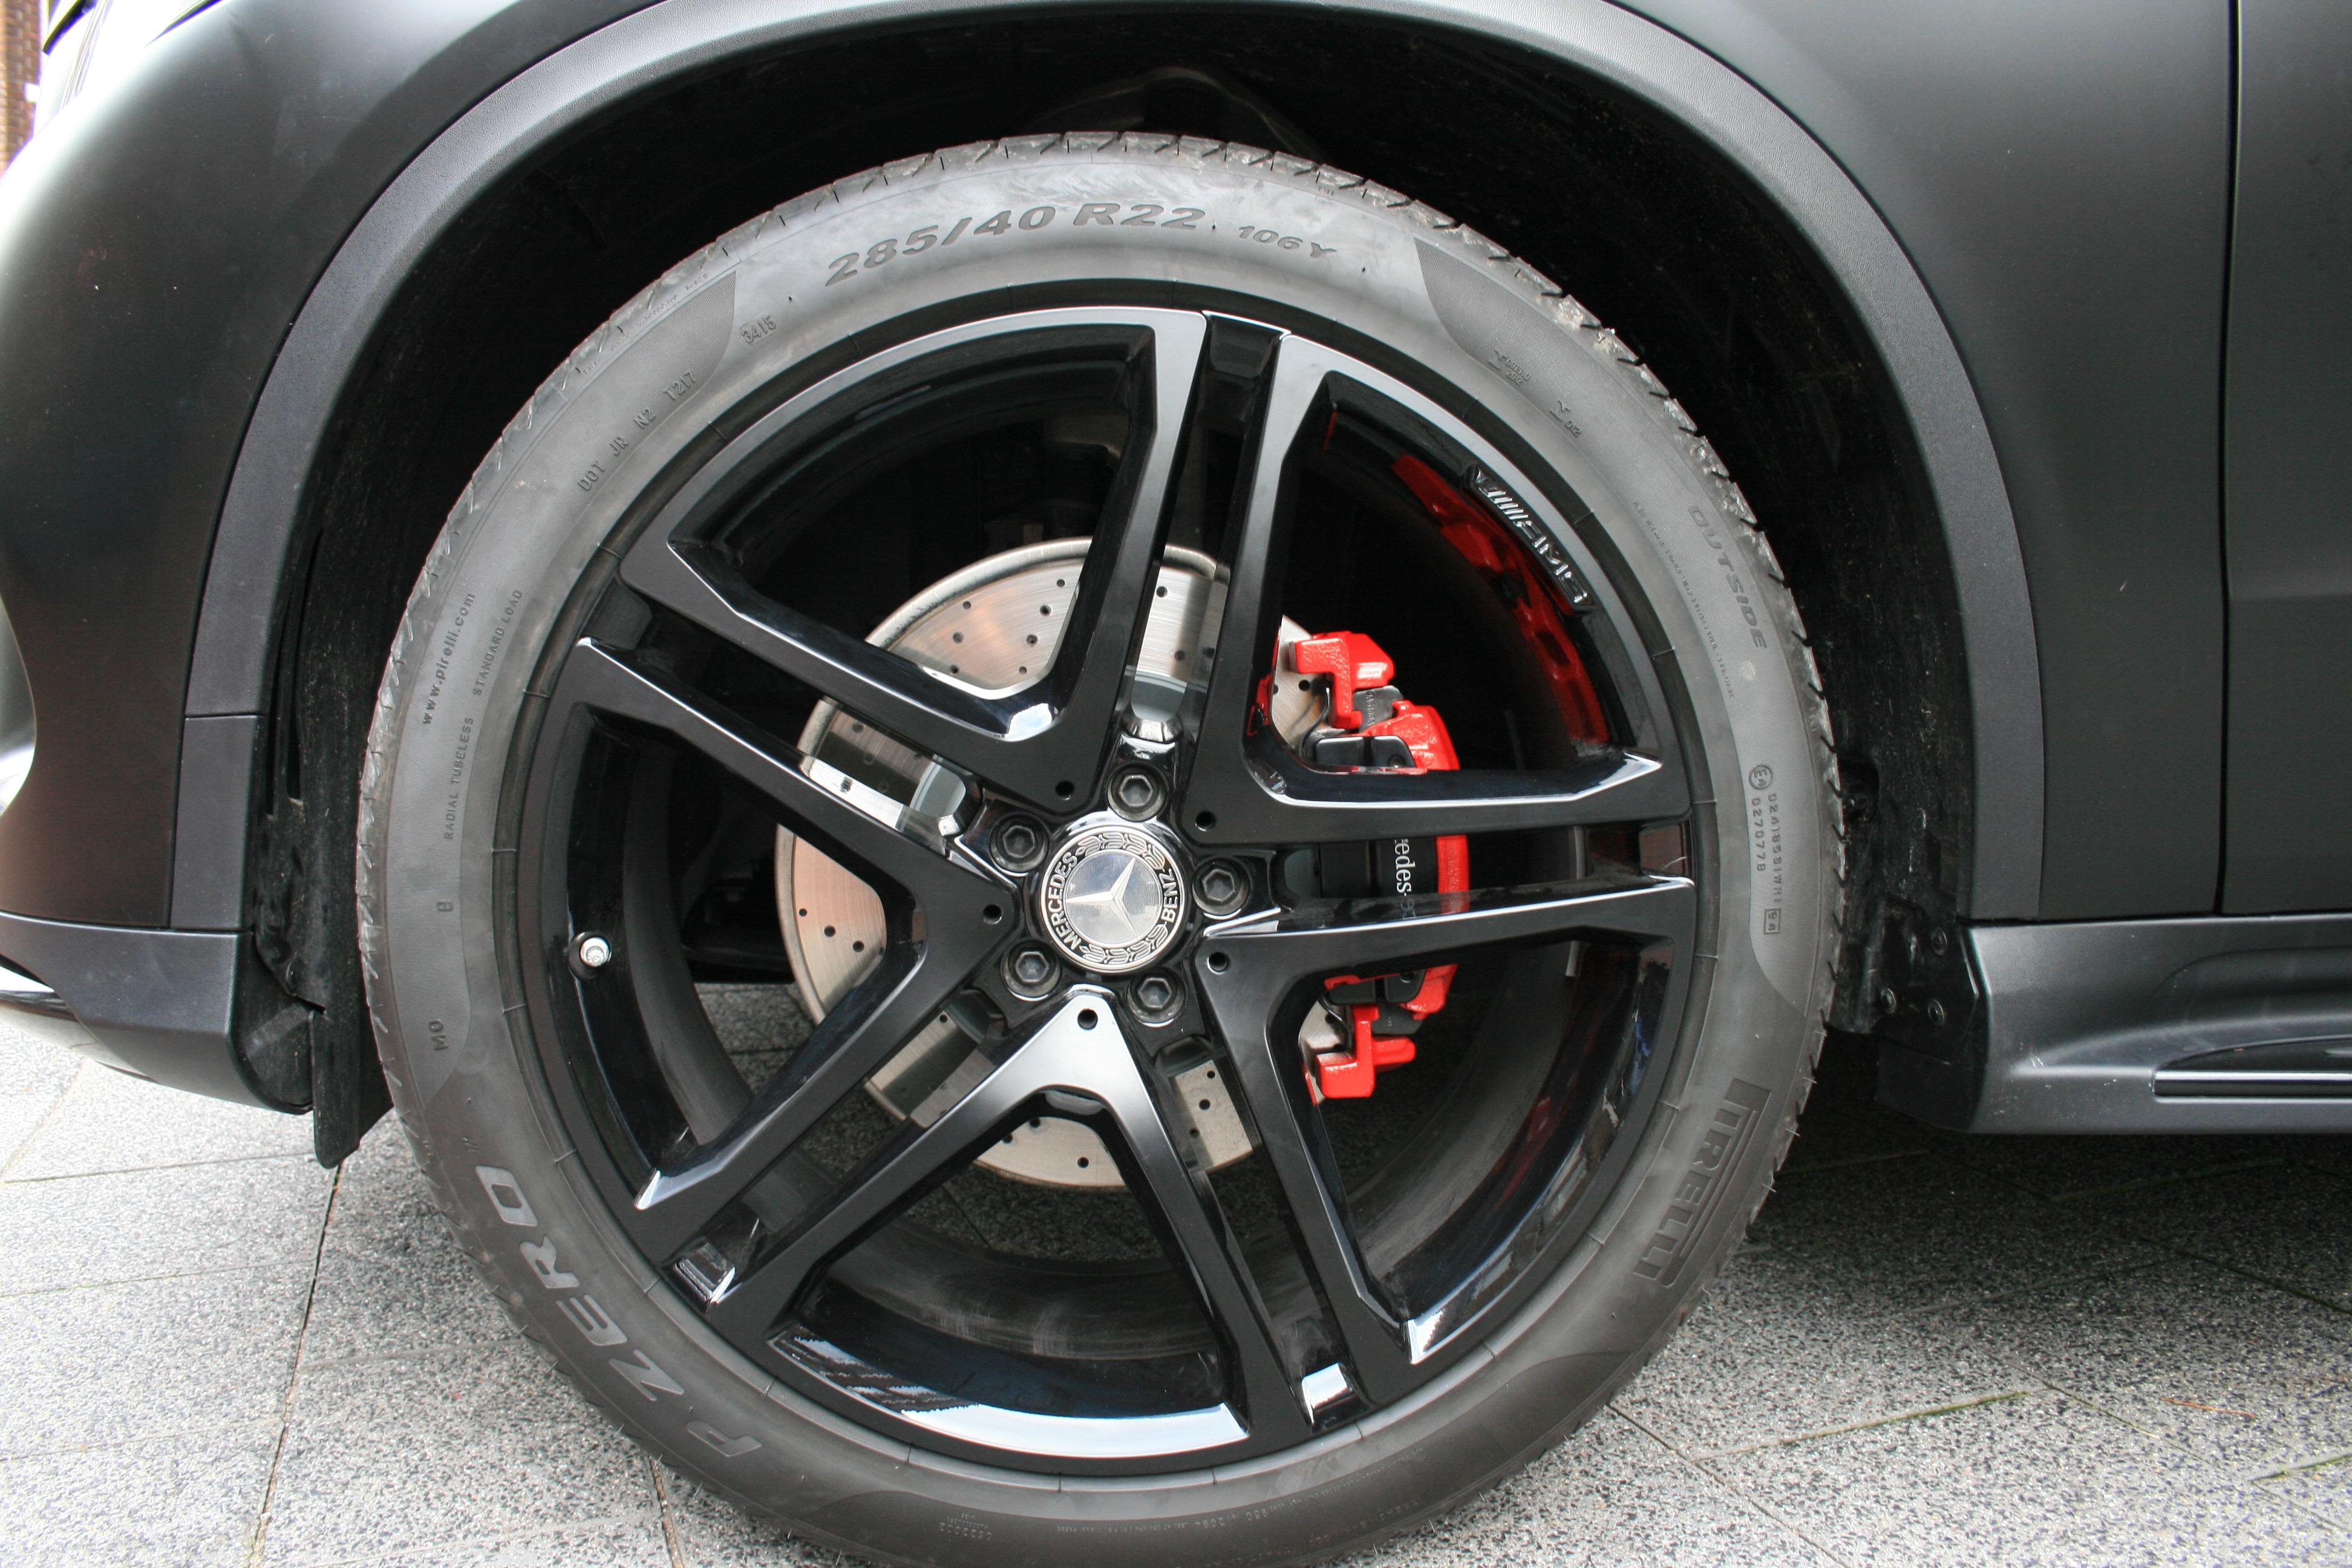 Mercedes Remklauwen Spuiten